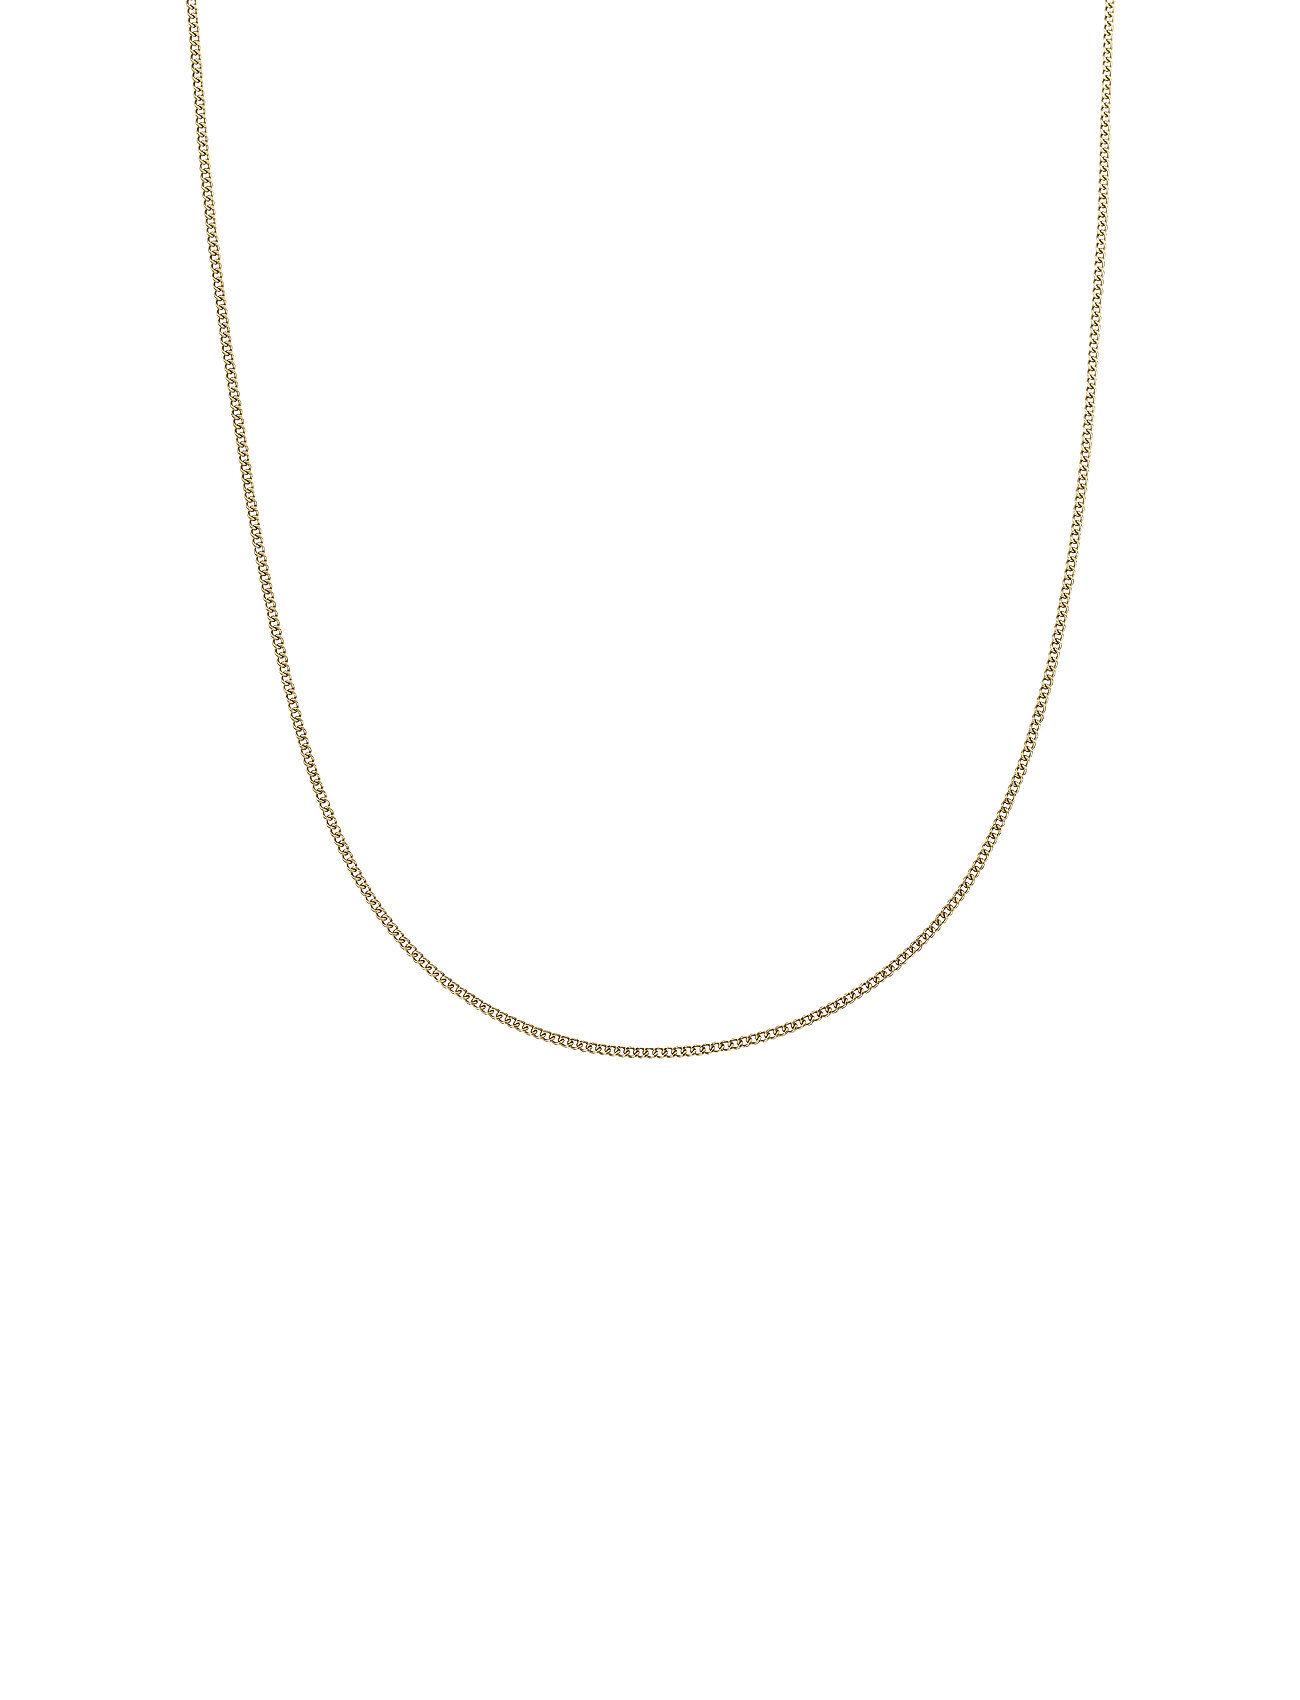 Edblad Charmentity Chain Curb 80 Cm Gold Accessories Jewellery Necklaces Dainty Necklaces Kulta Edblad